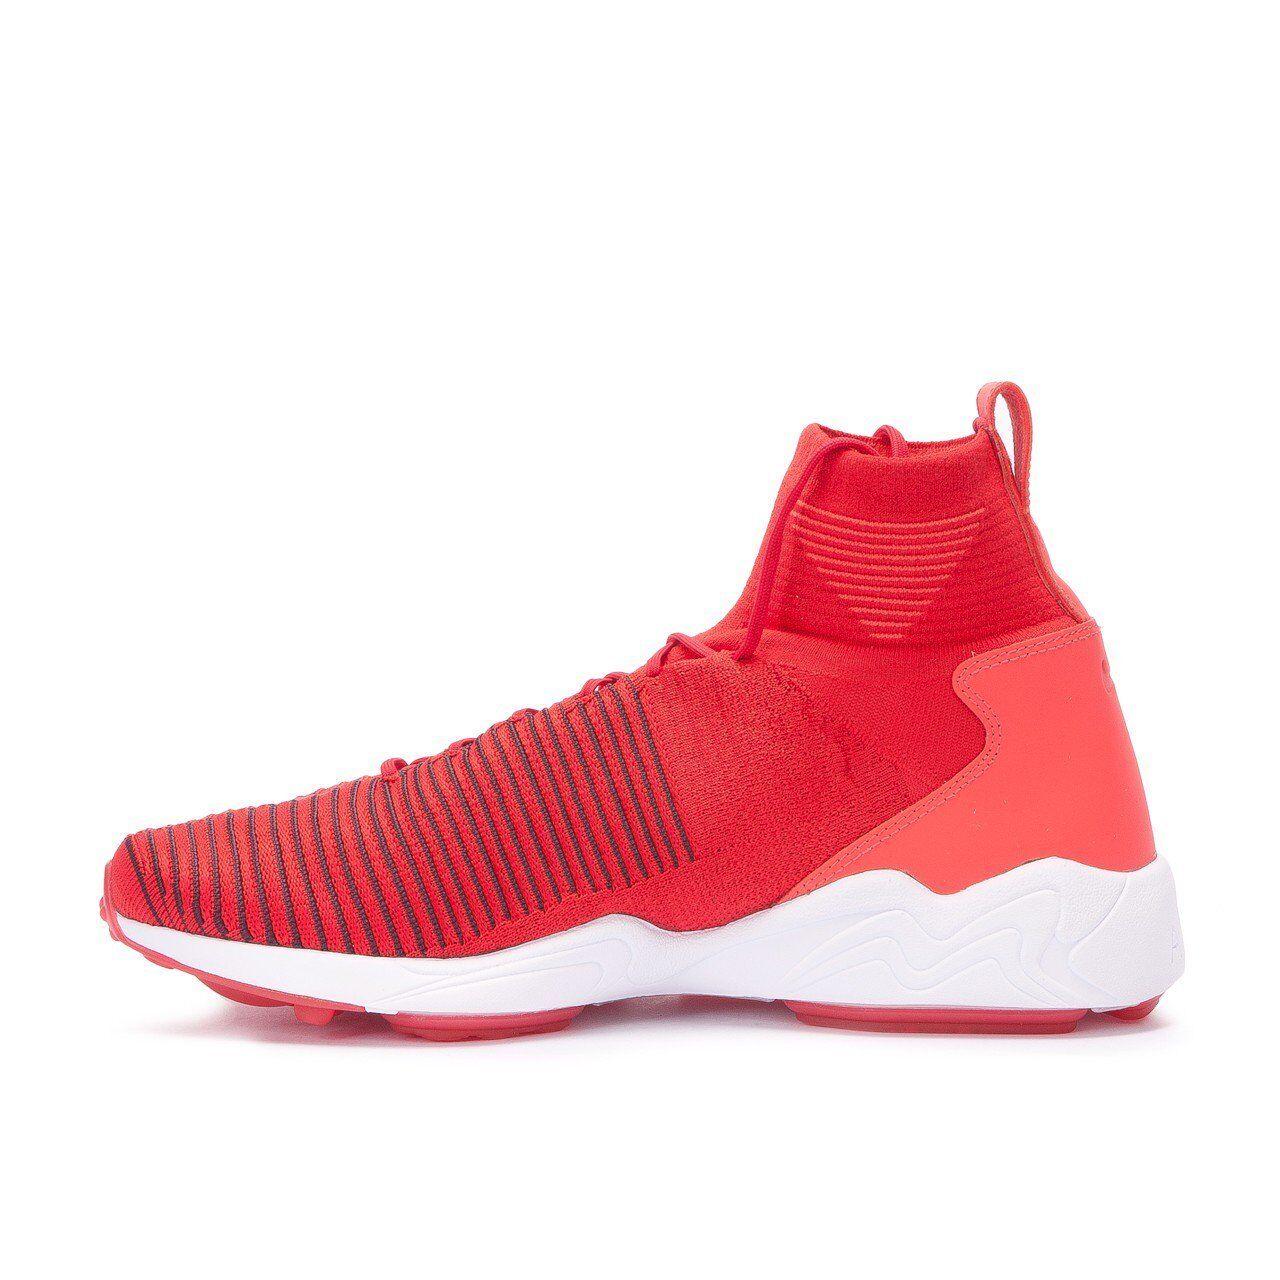 Nike MENS Zoom Mercurial XI FK University Red 844626-600 SIZE 11.5